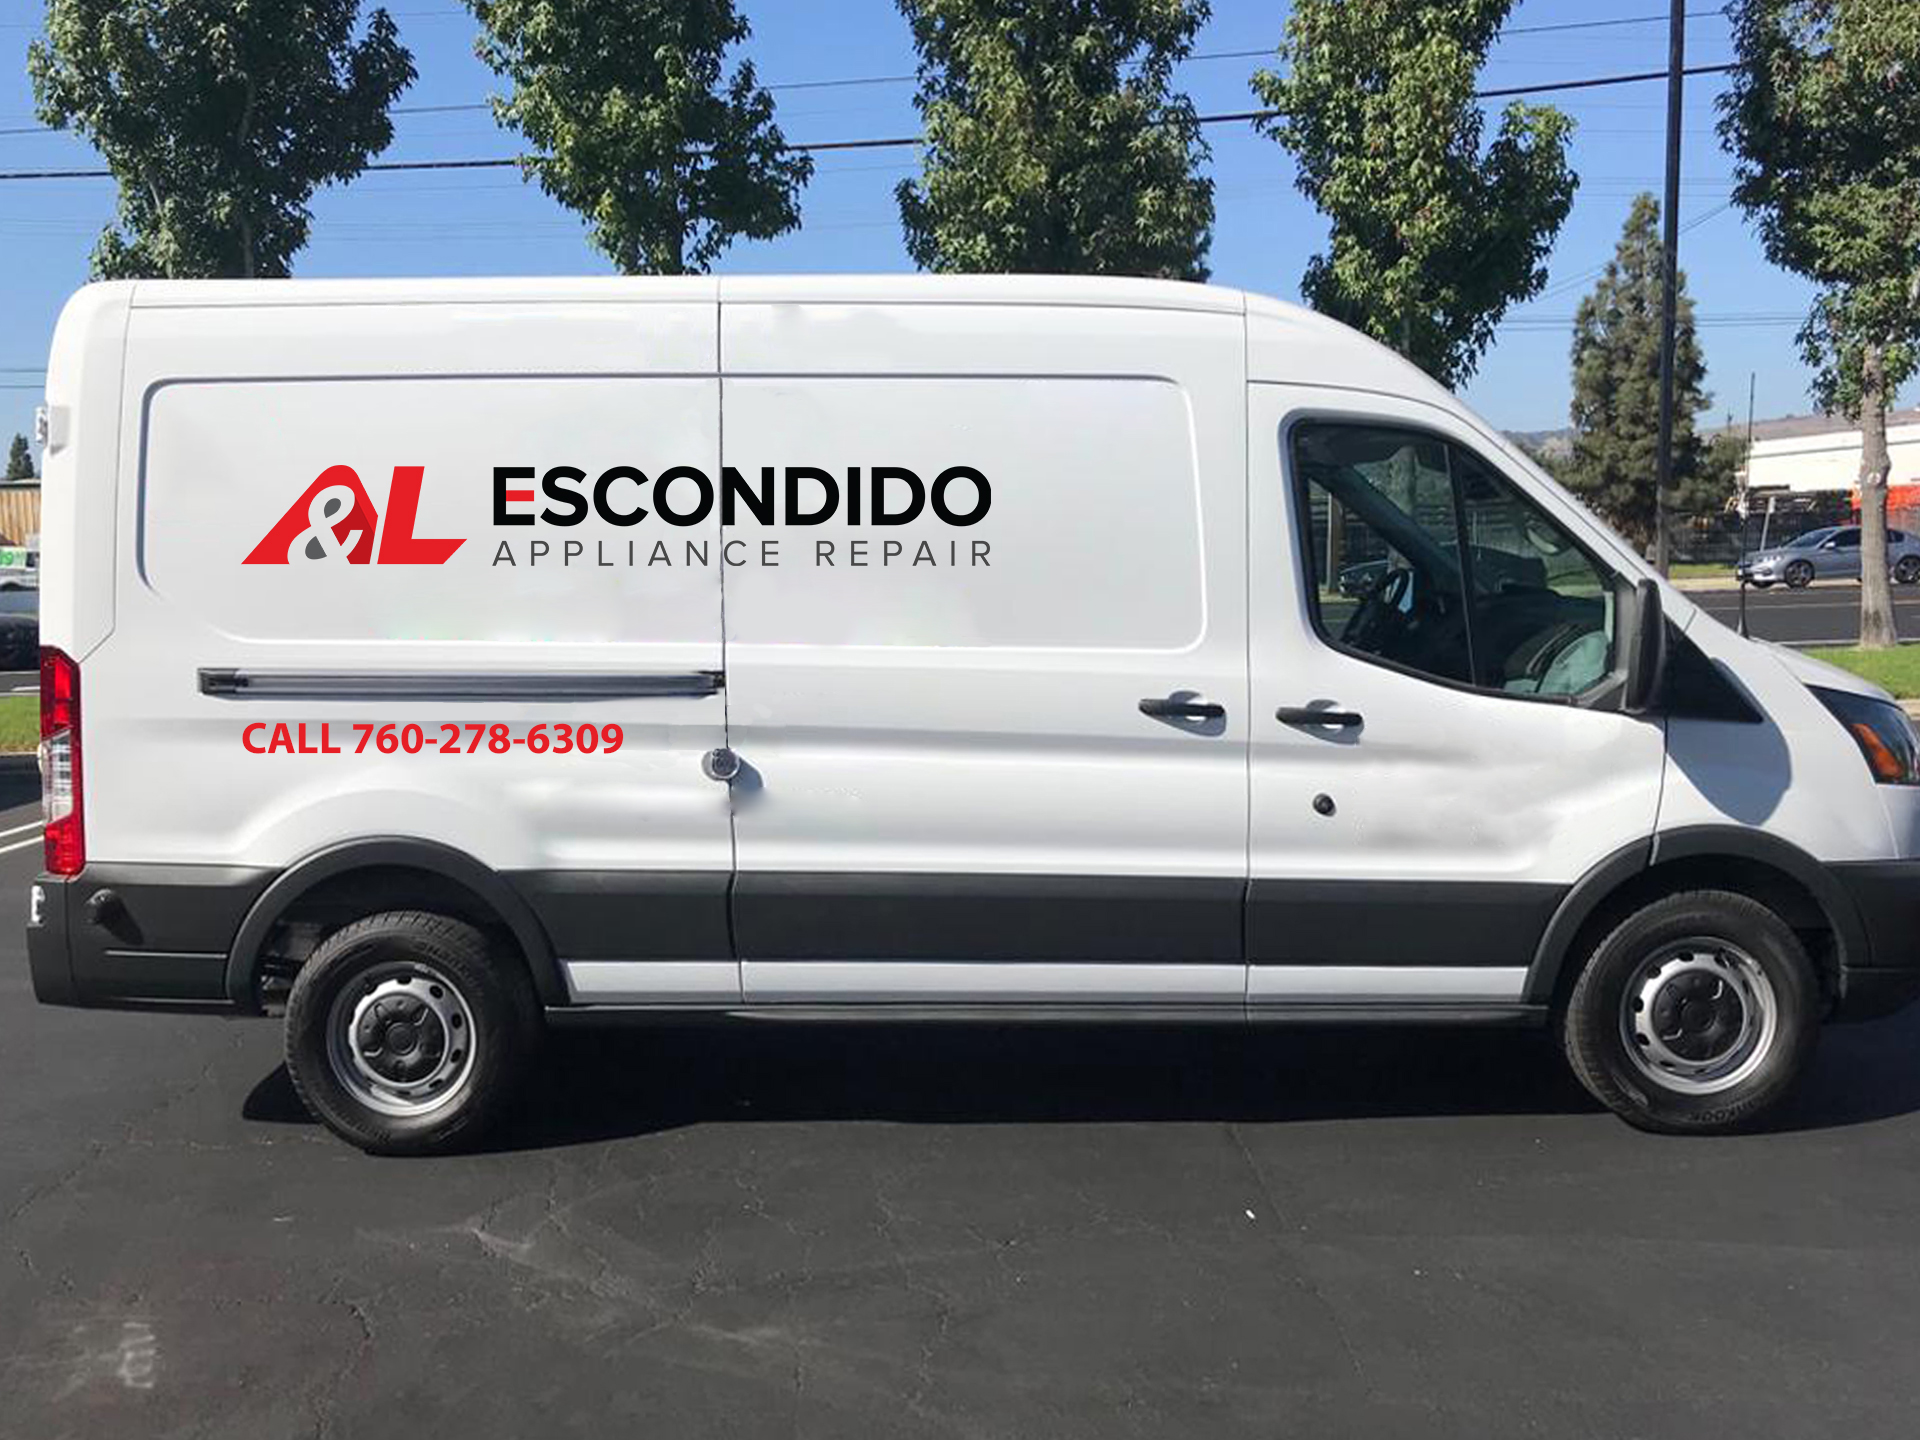 appliance repair van in escondido